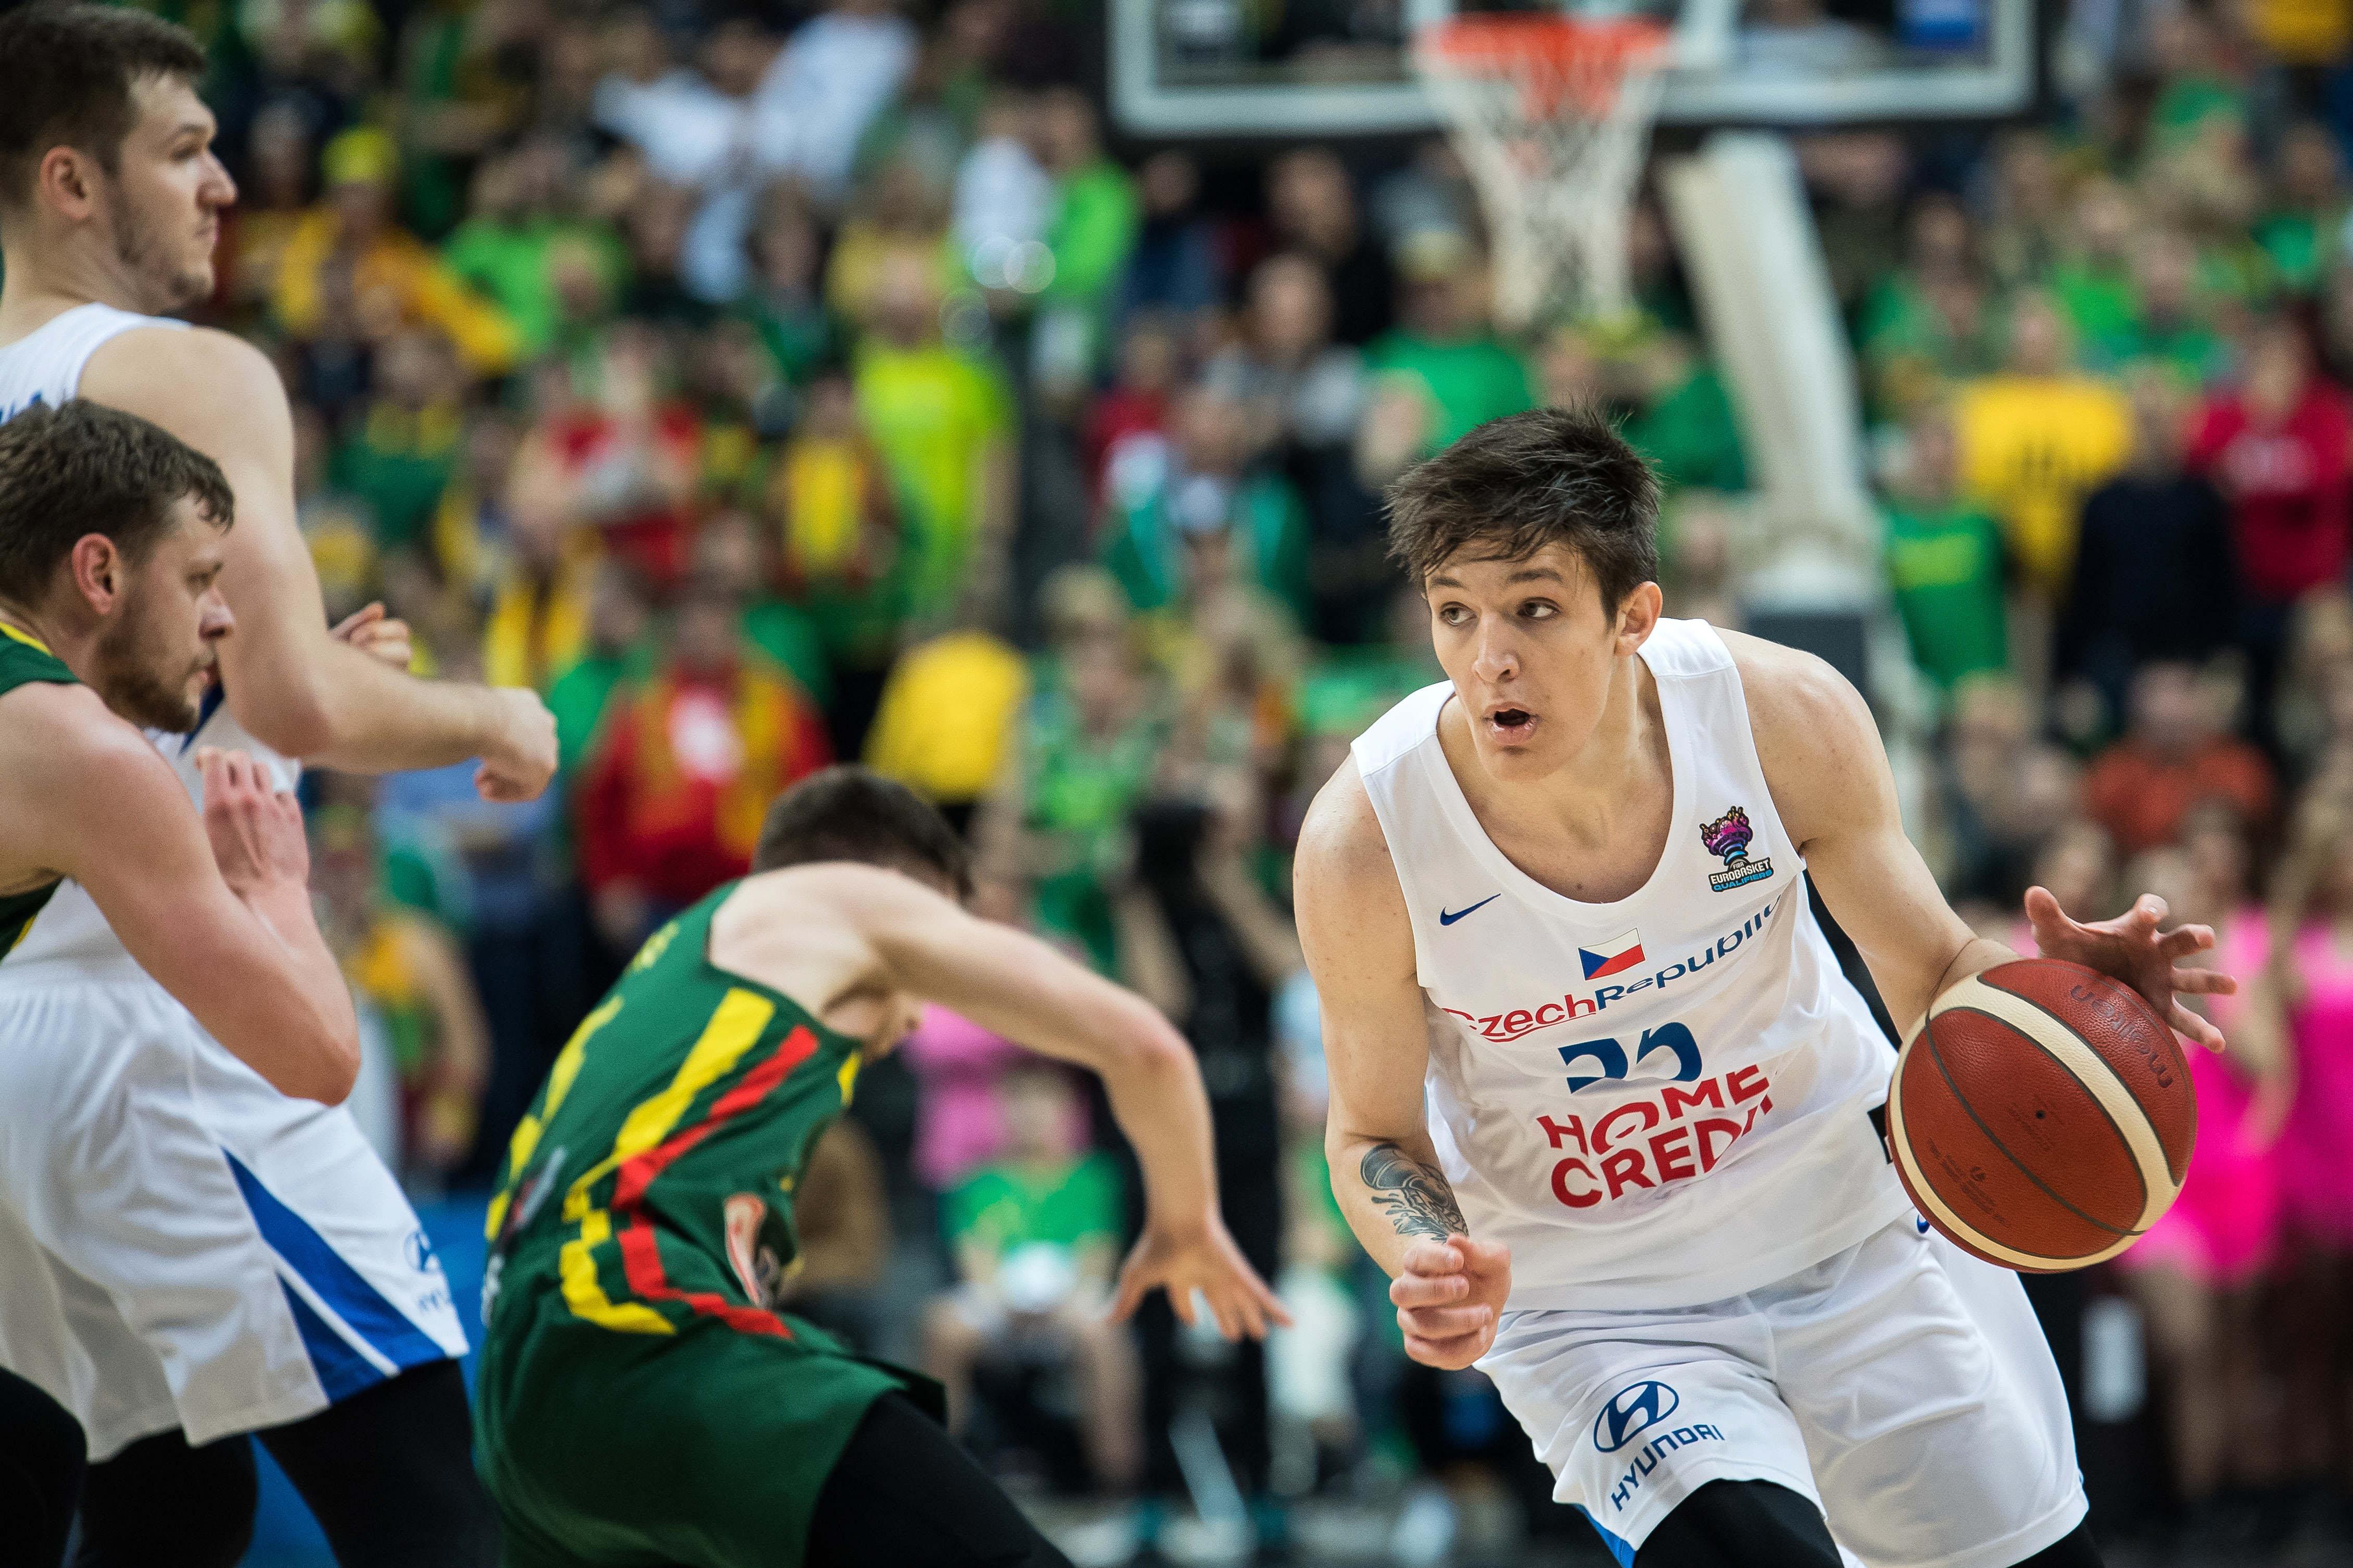 (SP)LITHUANIA-VILNIUS-BASKETBALL-FIBA EUROBASKET 2021 QUALIFIERS-LITHUANIA VS CZECH REPUBLIC